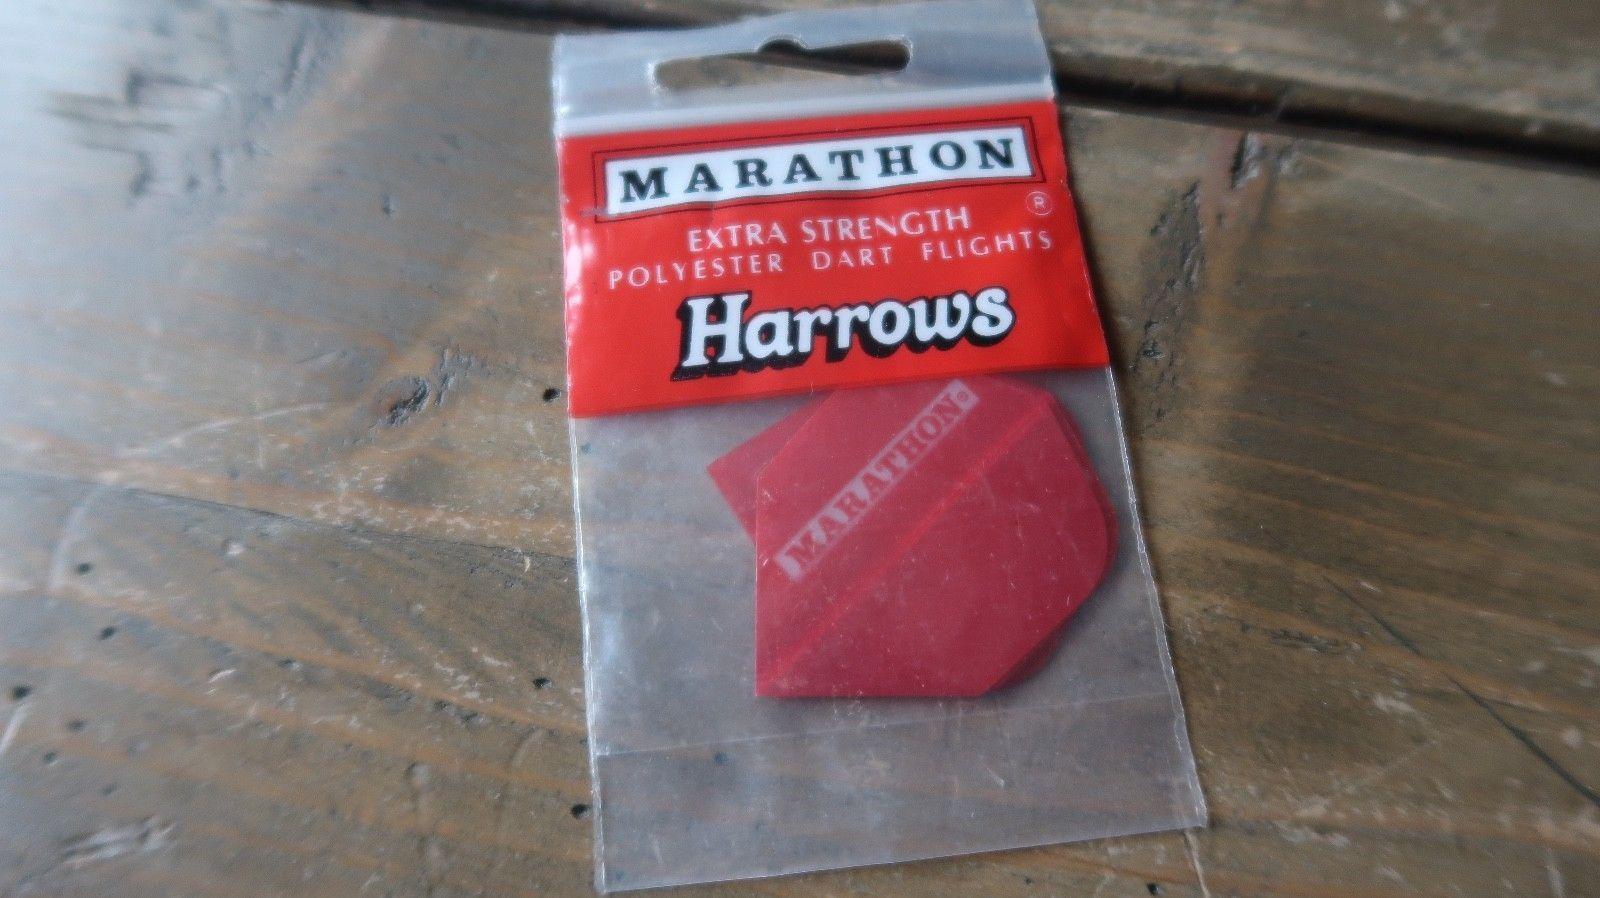 3 NEW Vintage Dart Flights MARATHON HARROWS